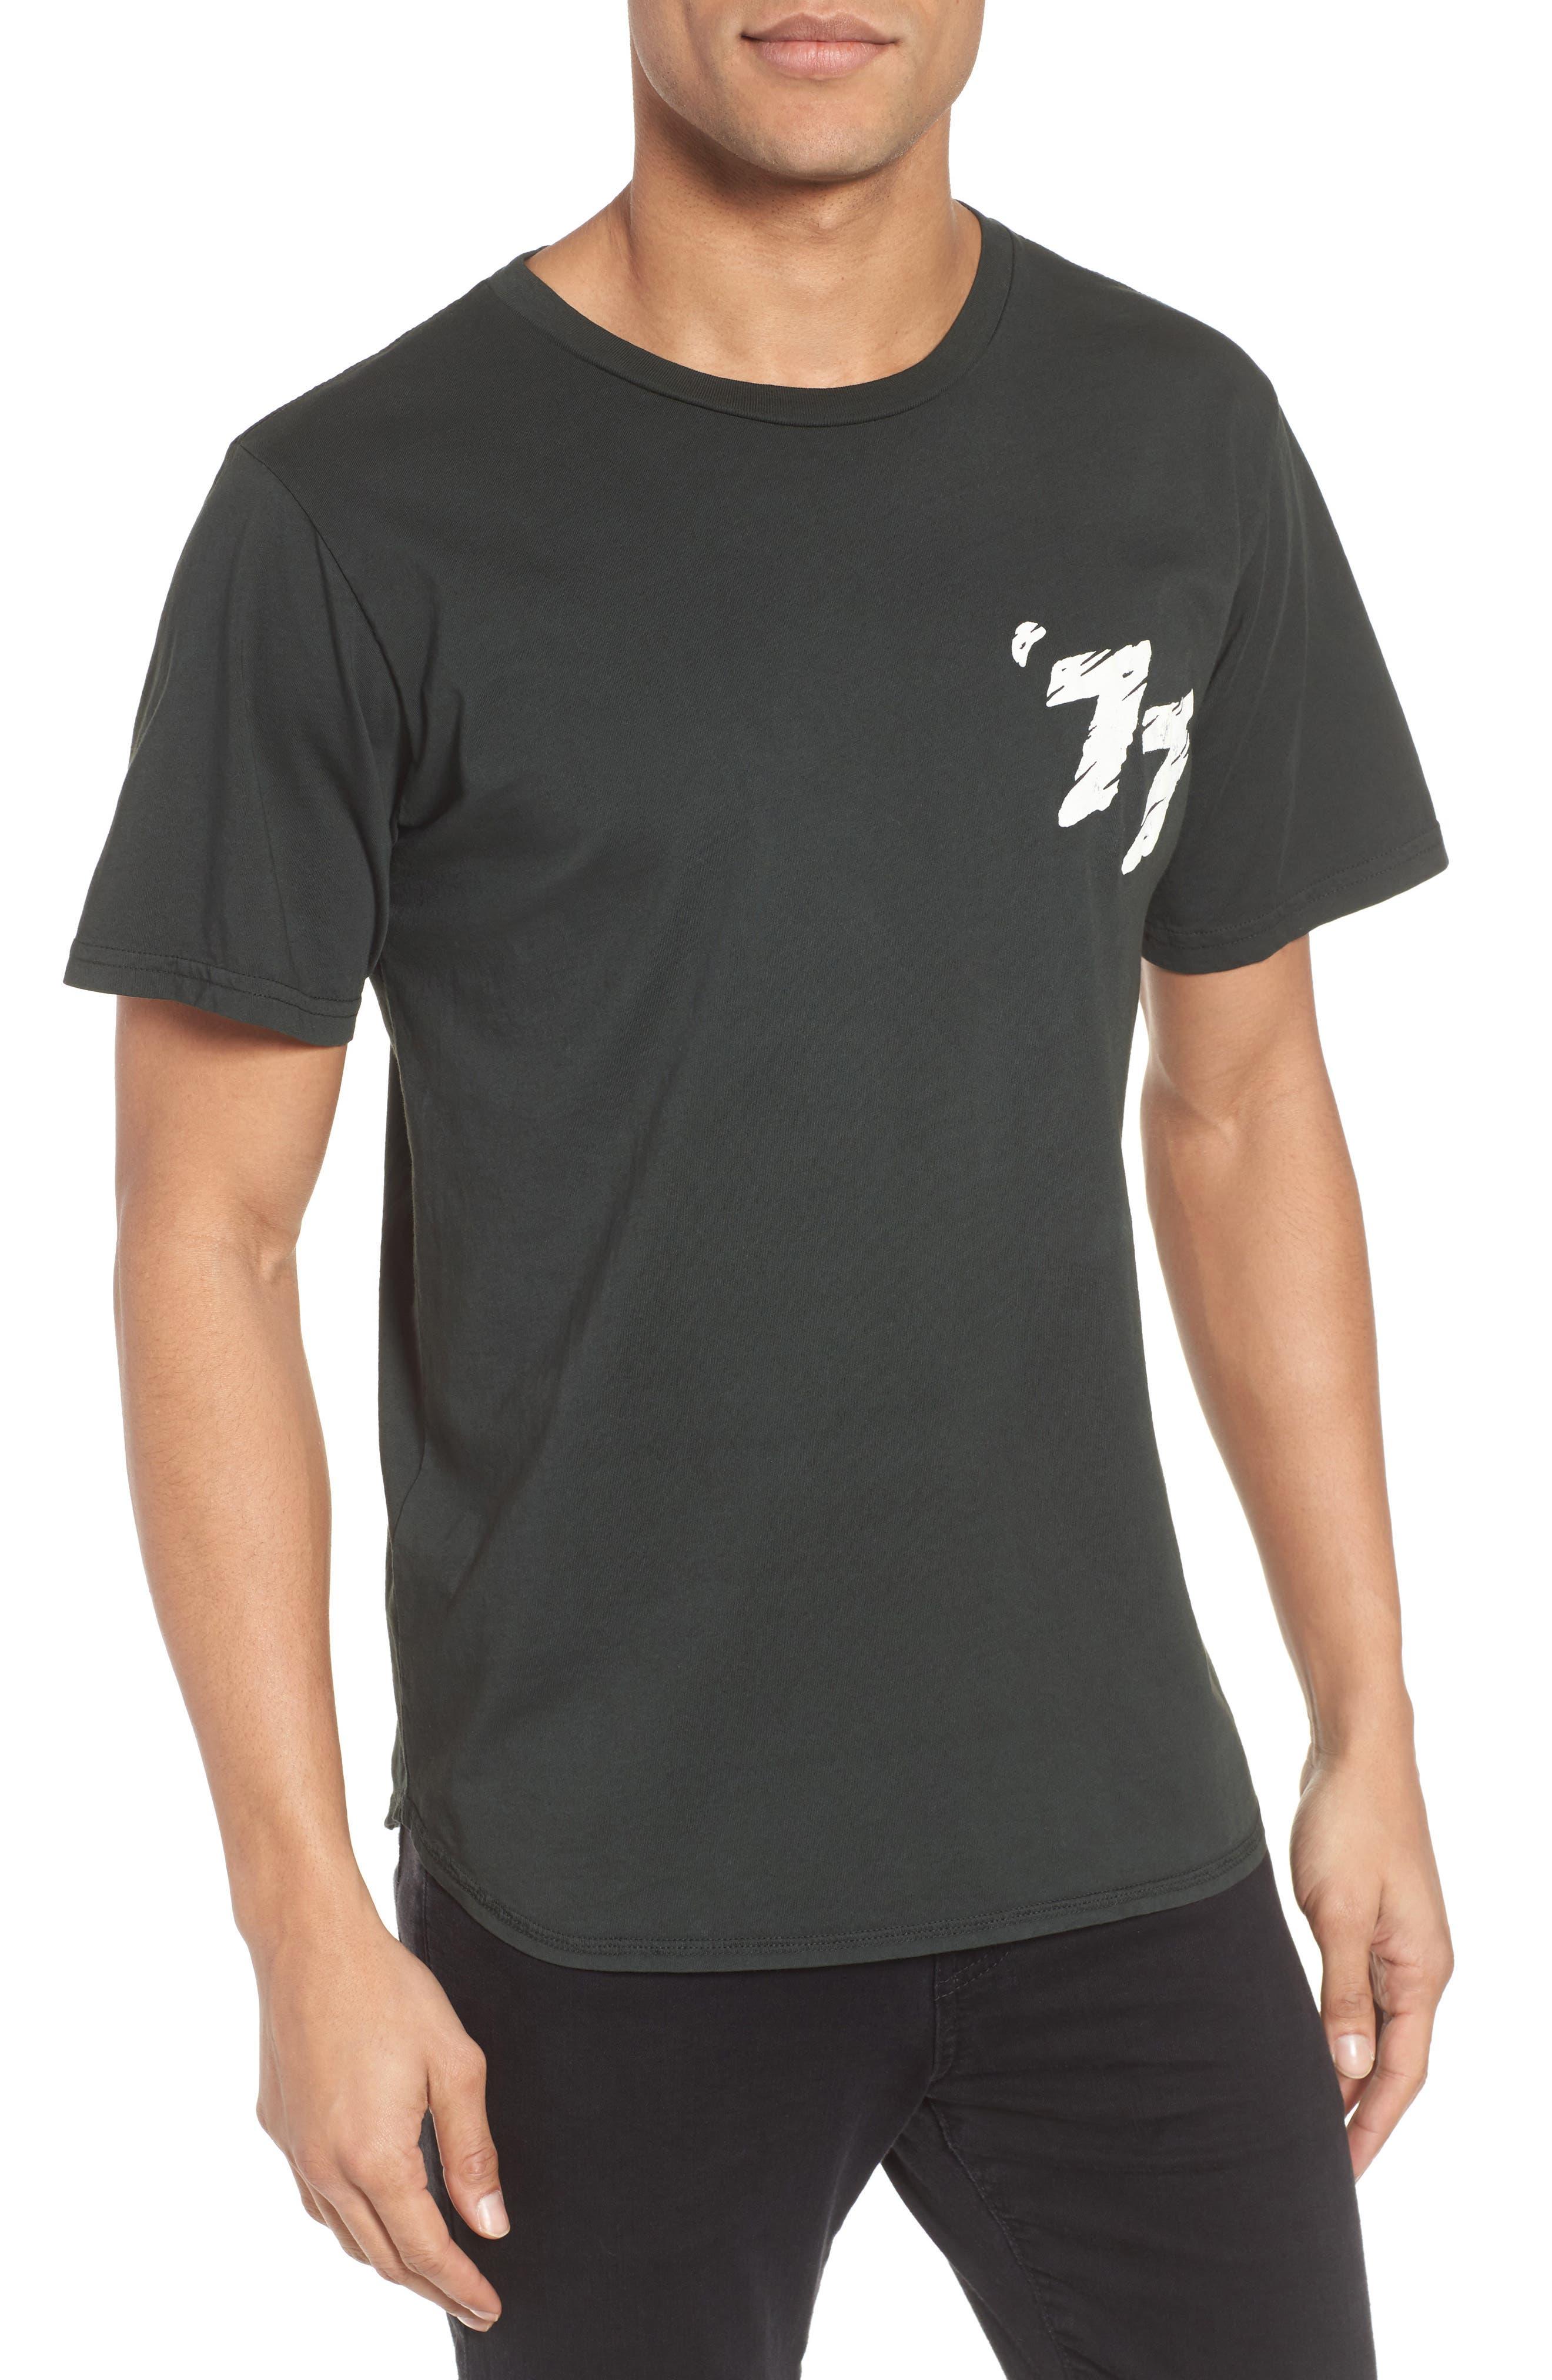 White Riot Graphic T-Shirt,                             Main thumbnail 1, color,                             Dusty Black